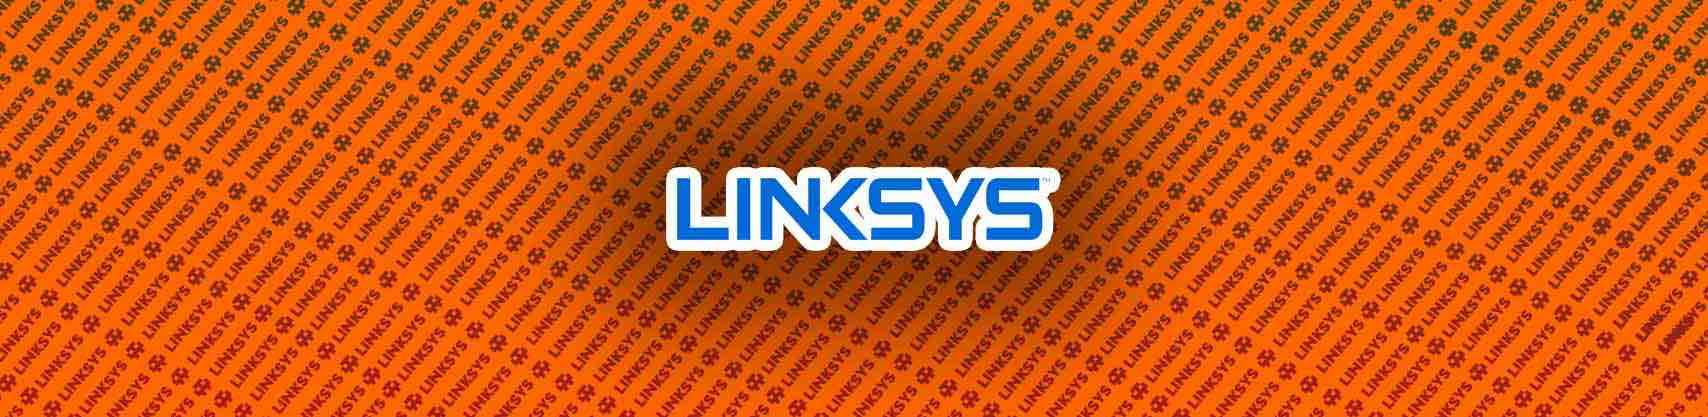 Linksys RE4000W Manual